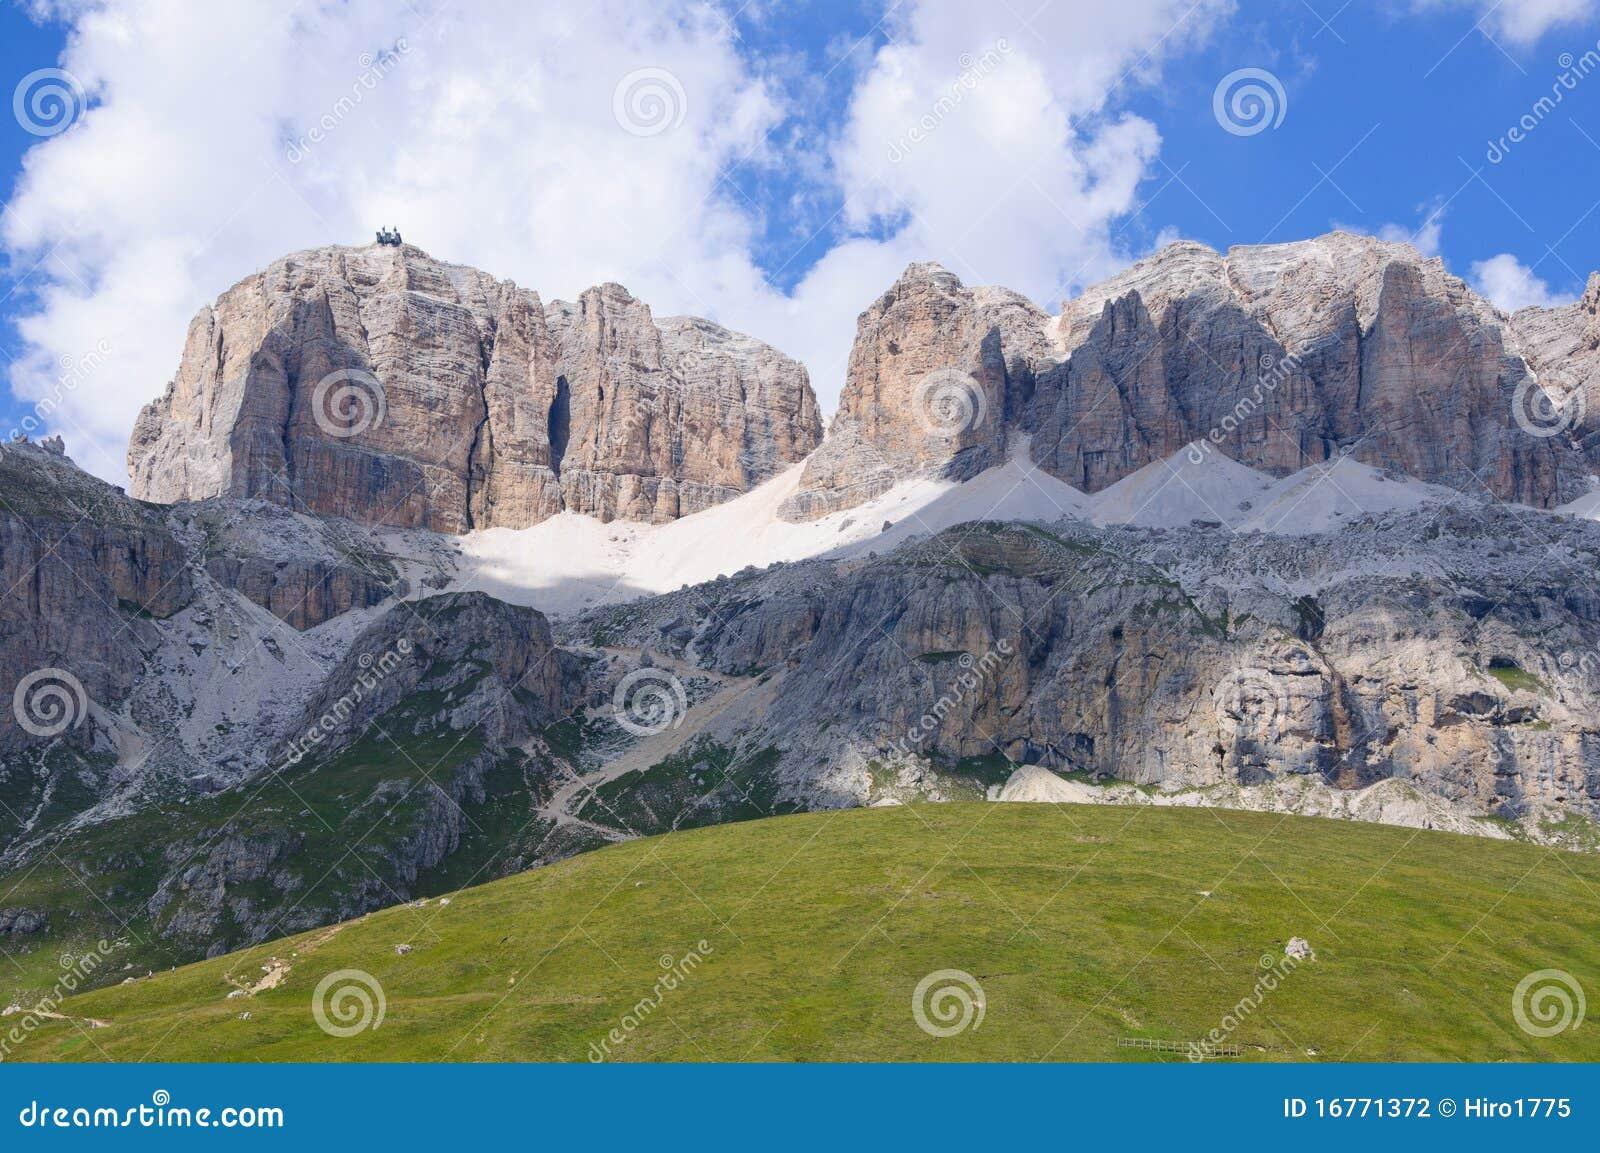 The Sella Massif Group - Dolomites, Italy Stock Photography - Image ...